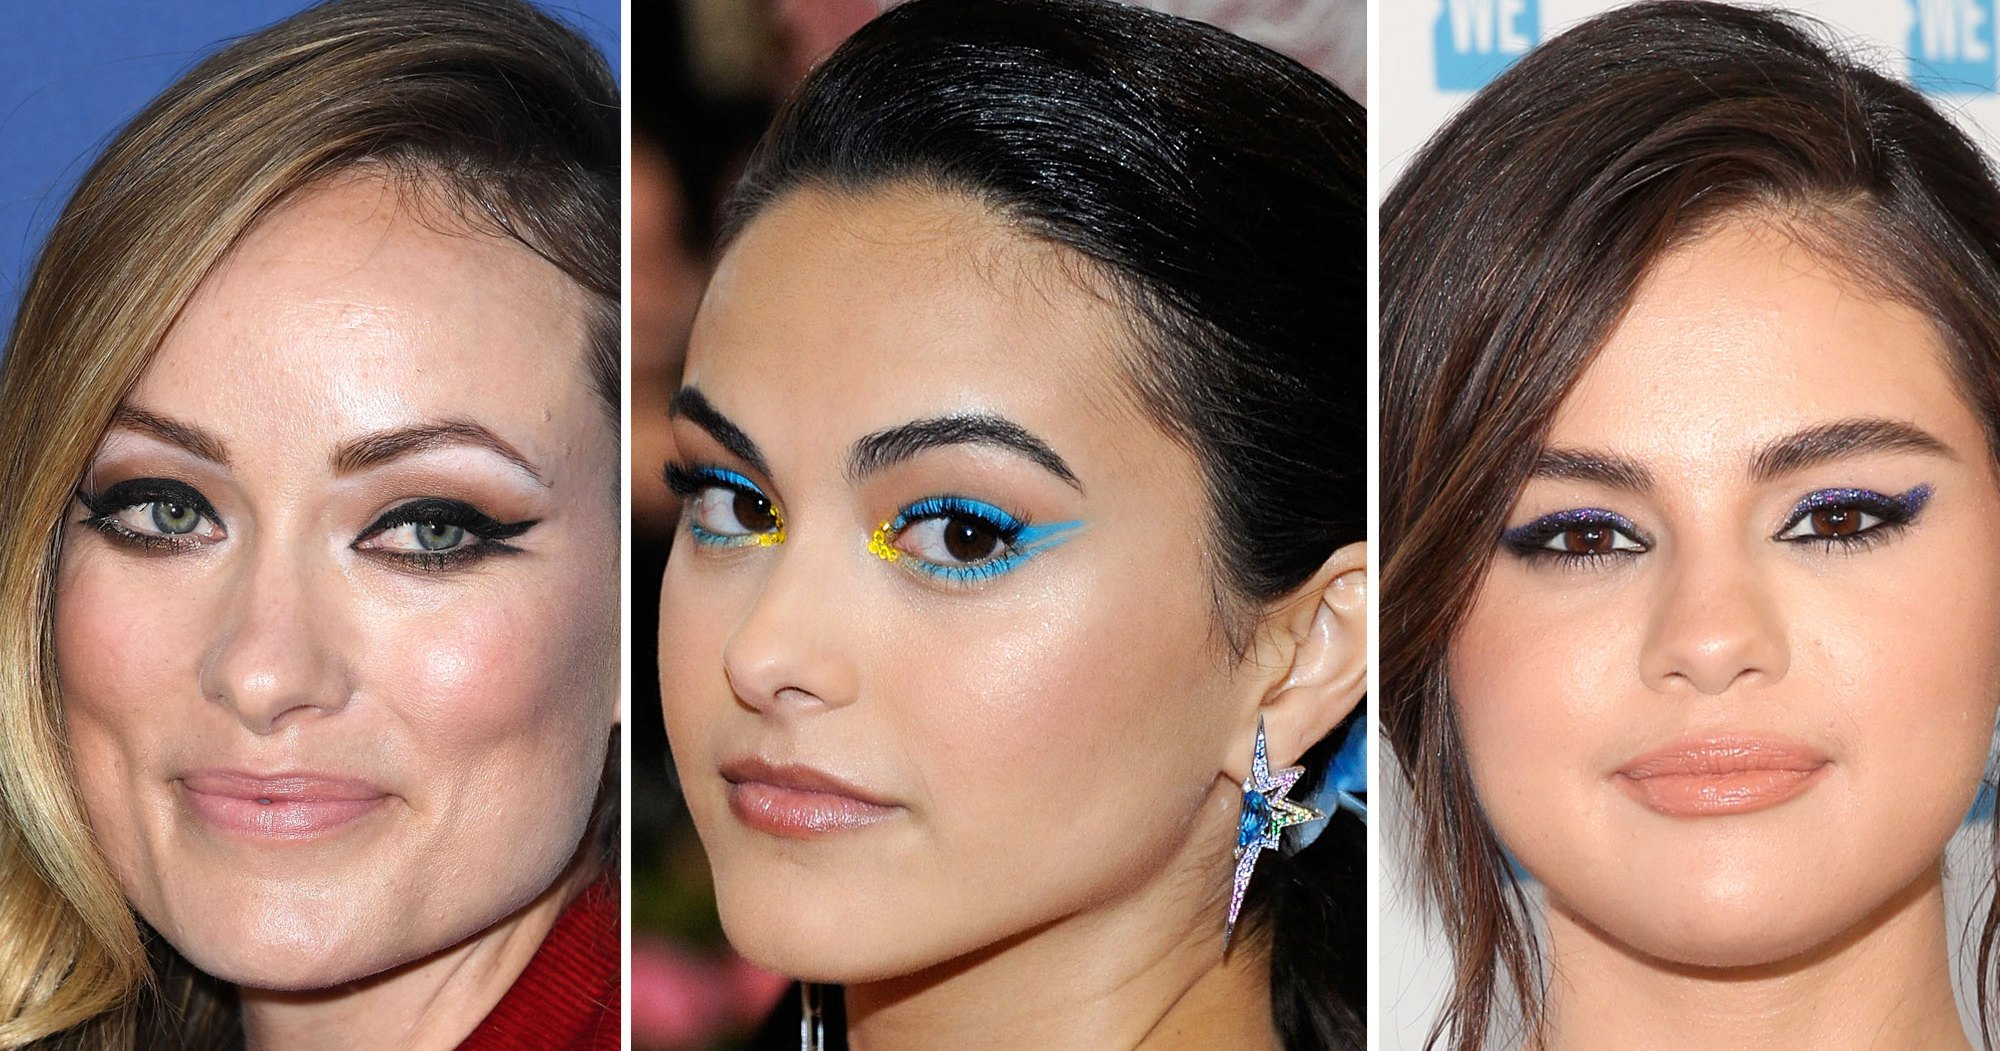 Celebrities Deliver Major Cat Eye Inspo to Freshen Up the Makeup Look